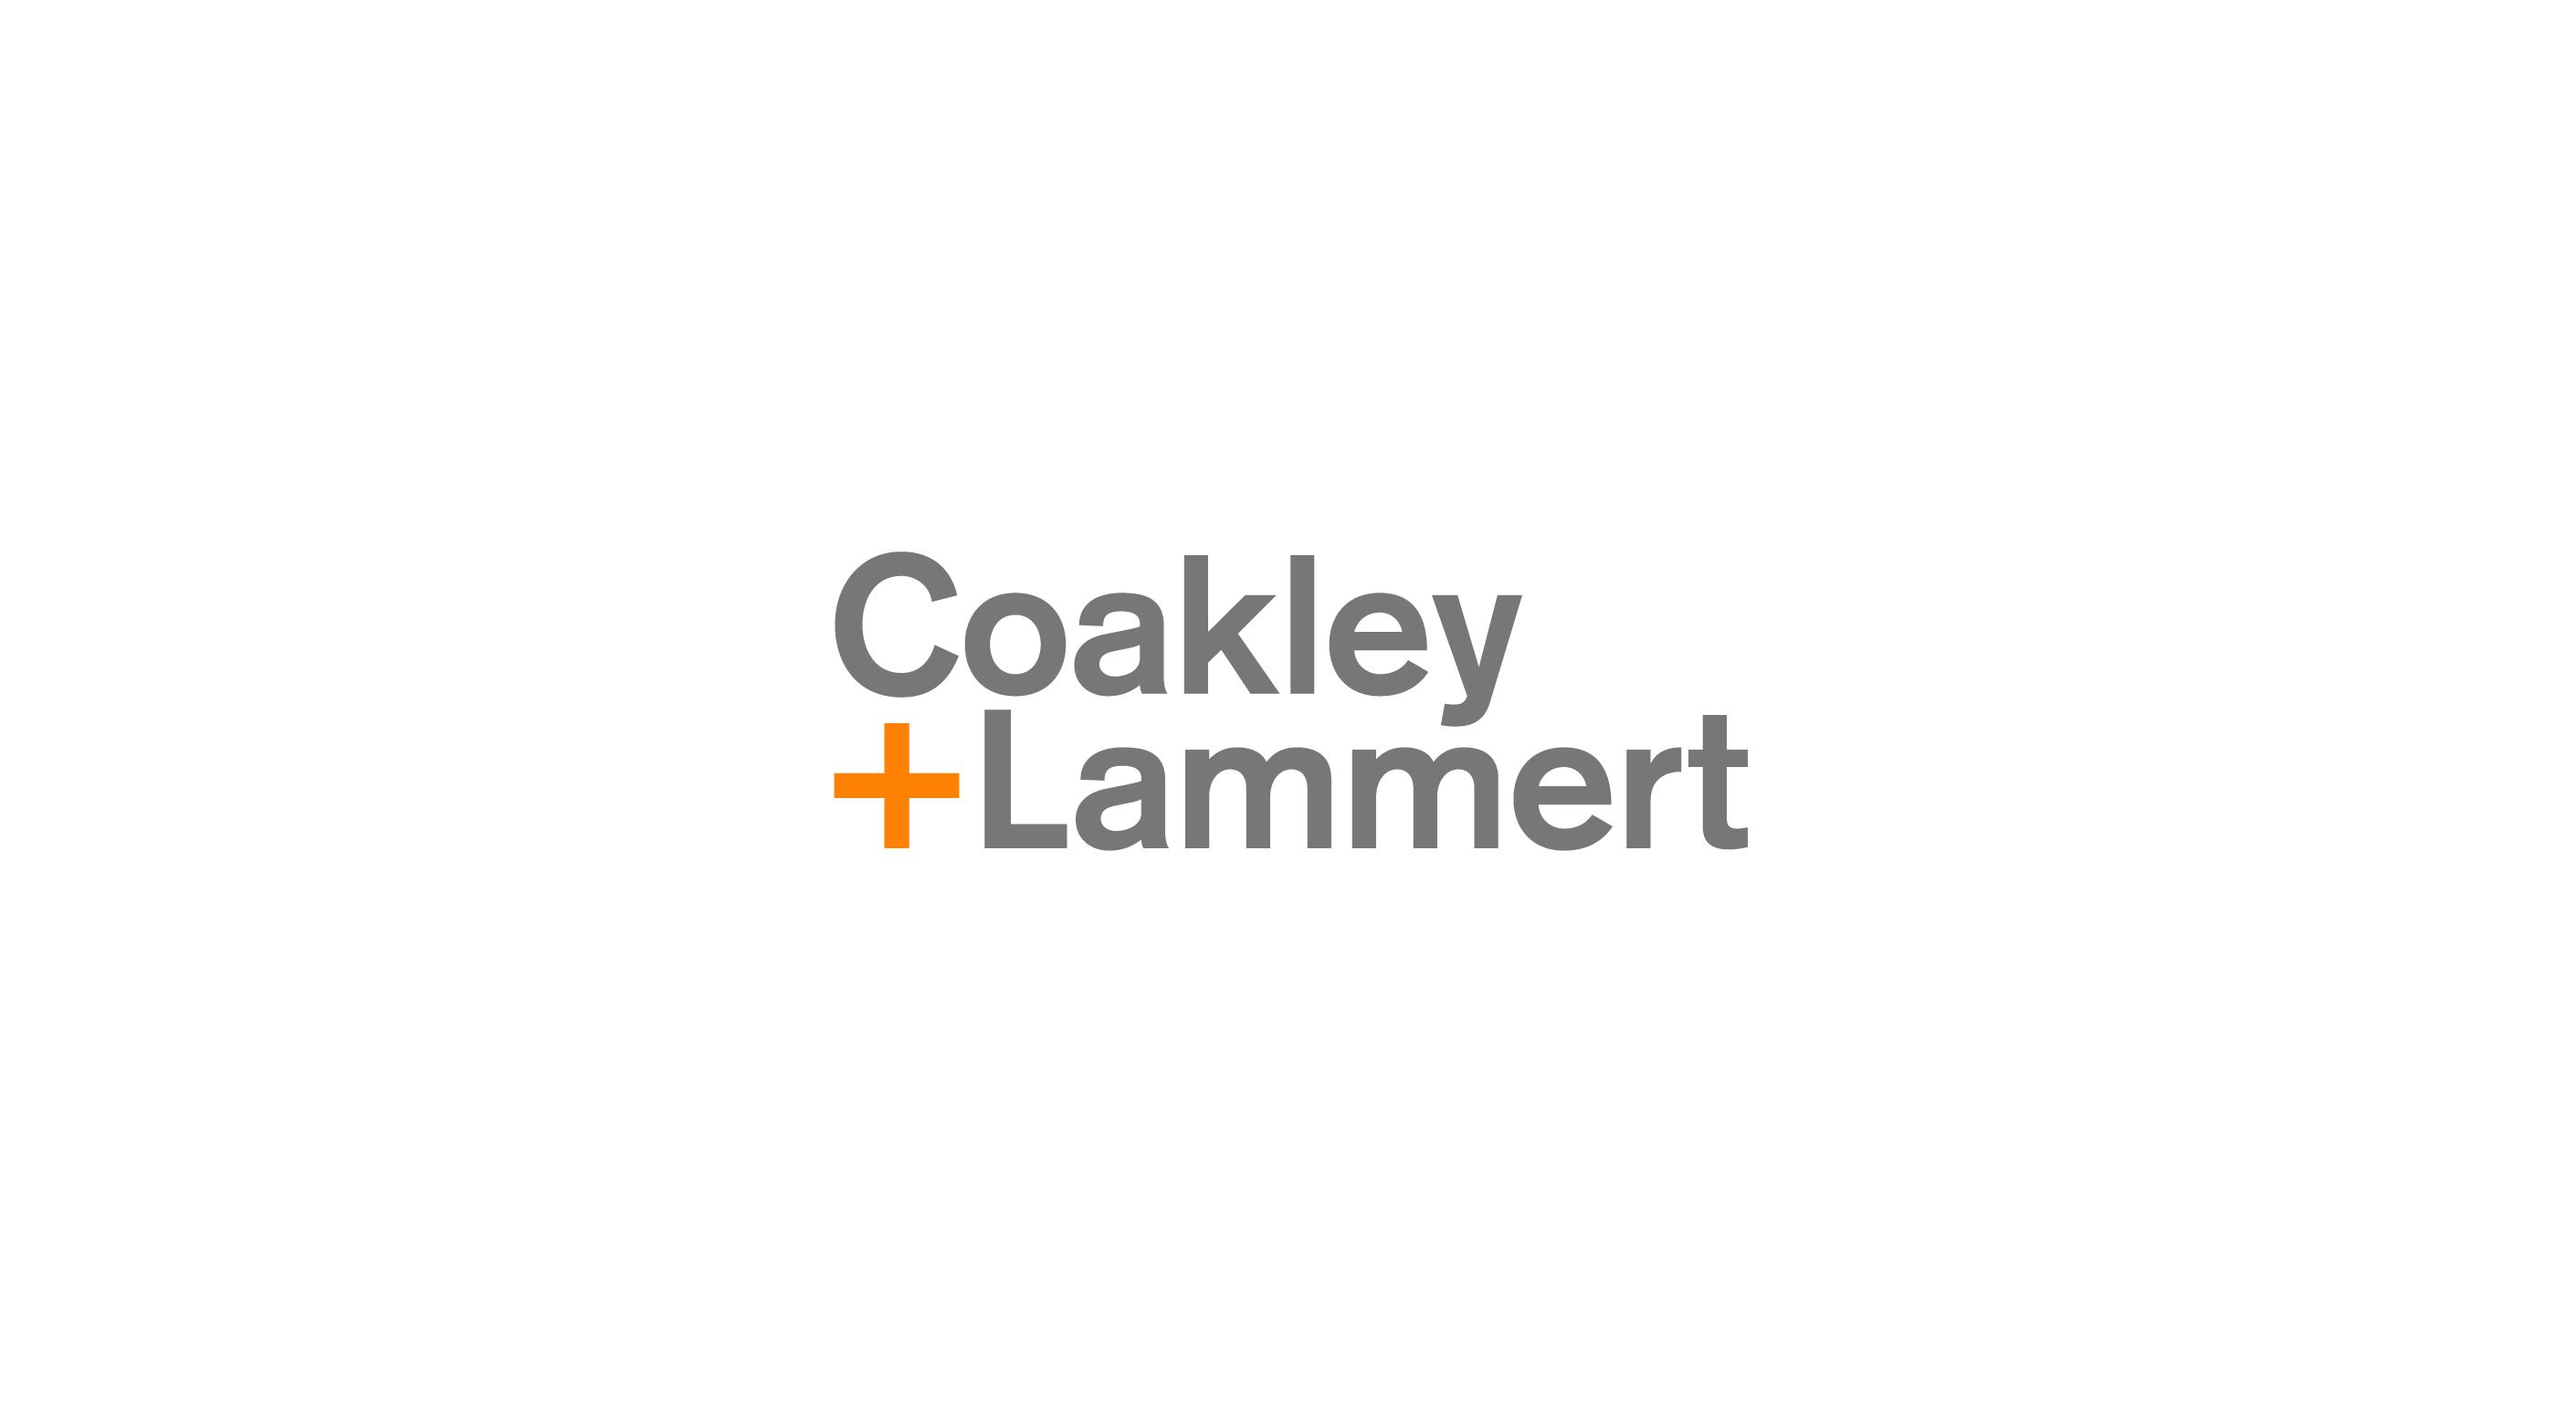 Coakley+Lammert